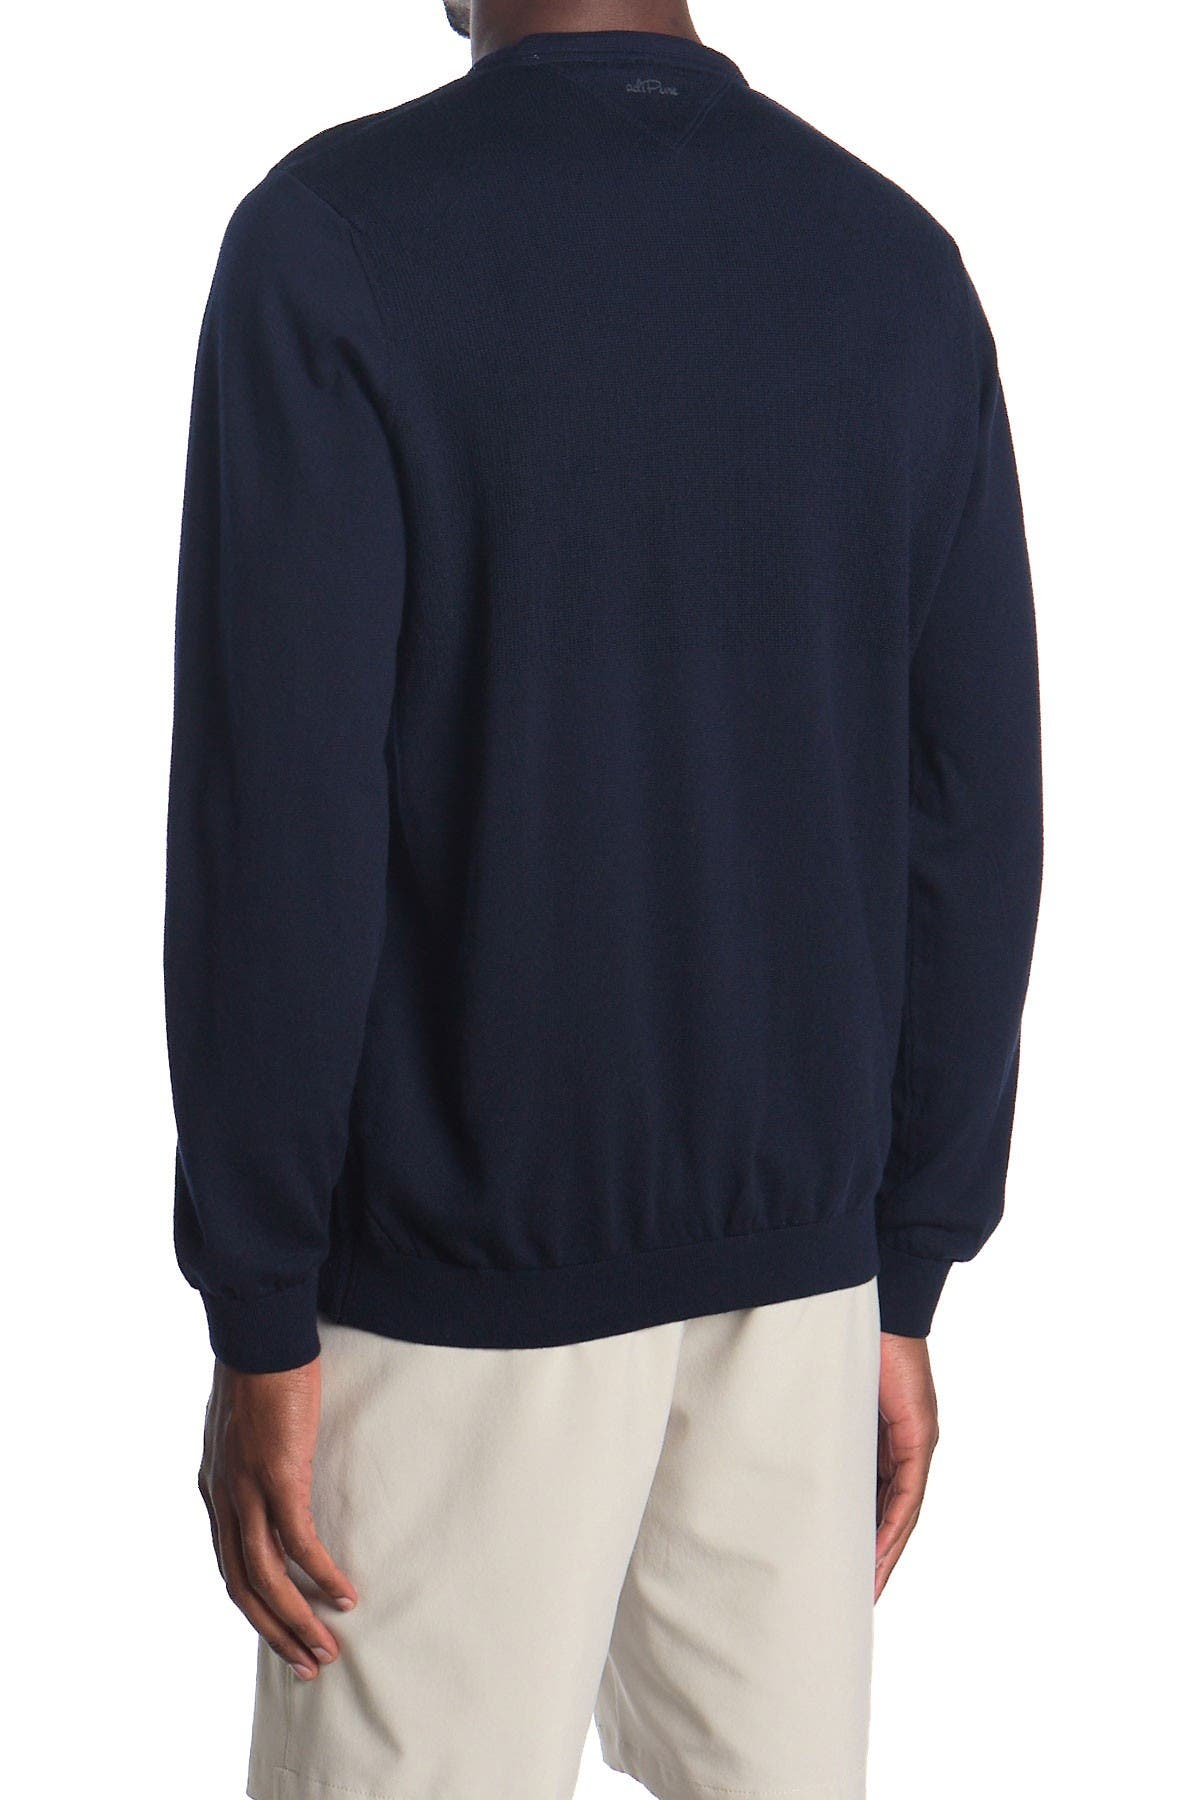 Adidas Adipure Refined V-Neck Golf Sweater